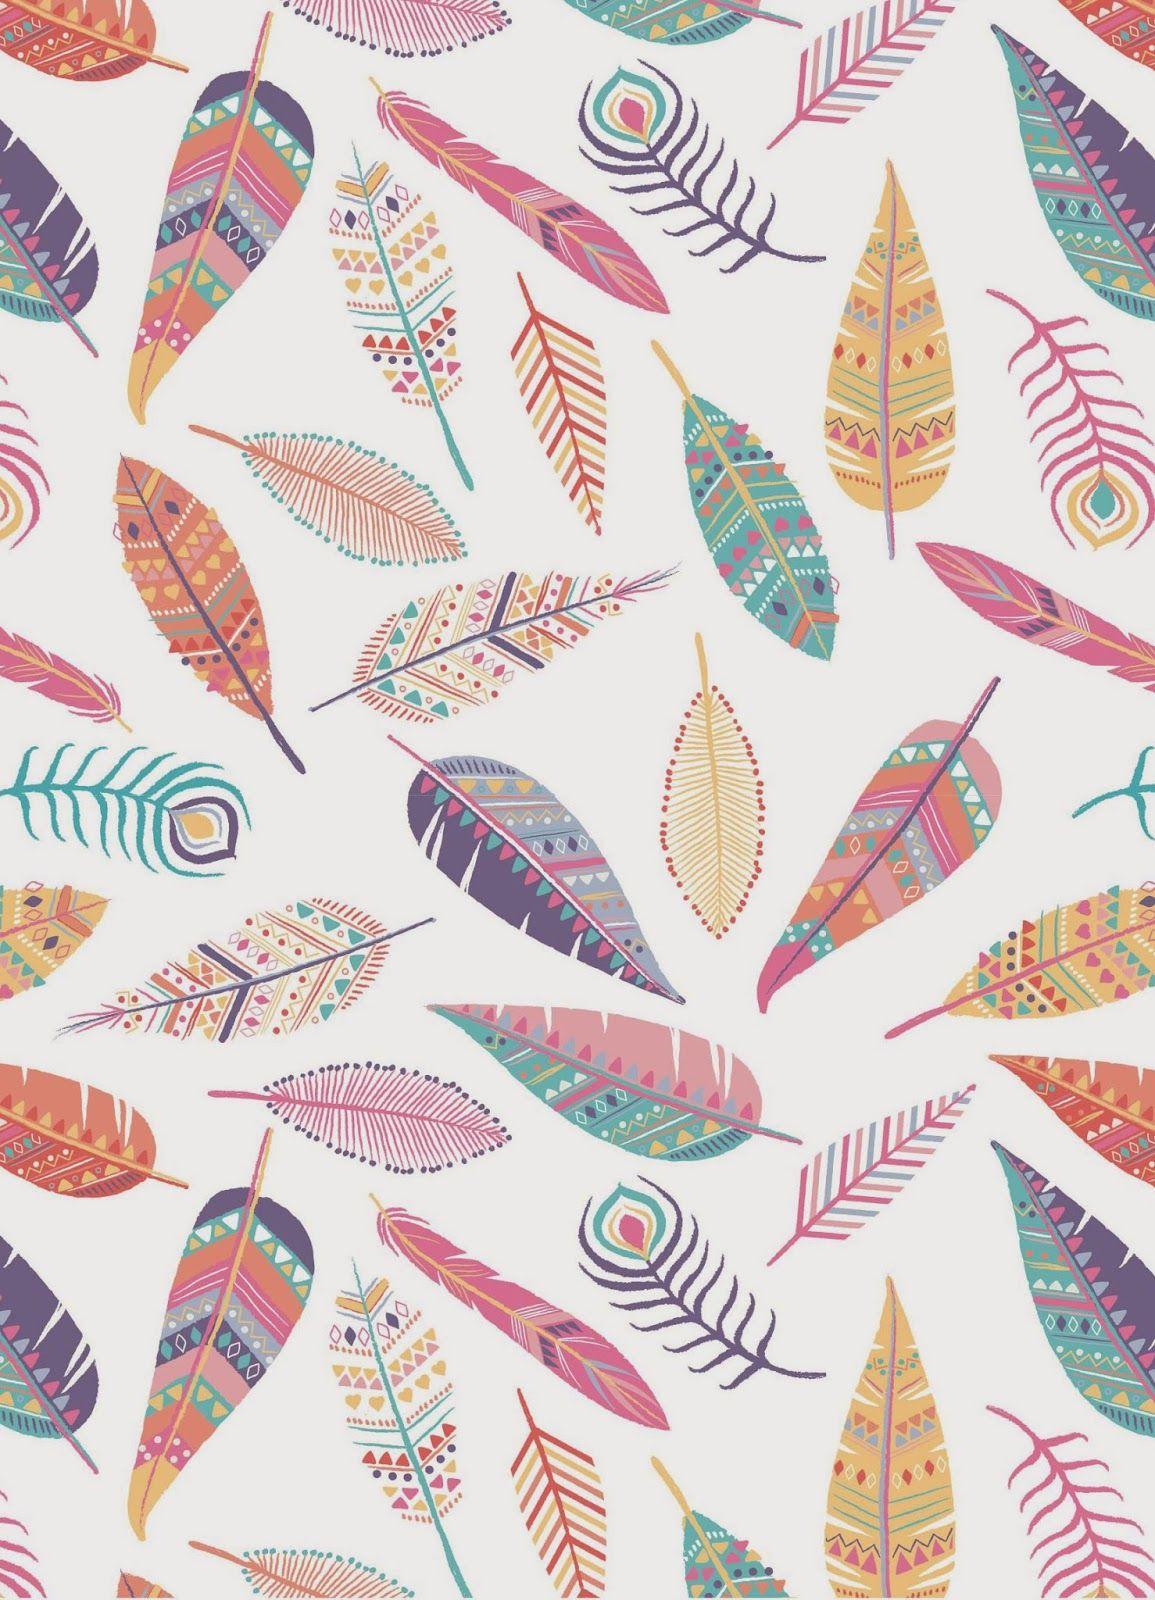 Http Emilykiddy Blogspot Com Es 2015 06 Feather Print Html Pattern Wallpaper Feather Wallpaper Pattern Art